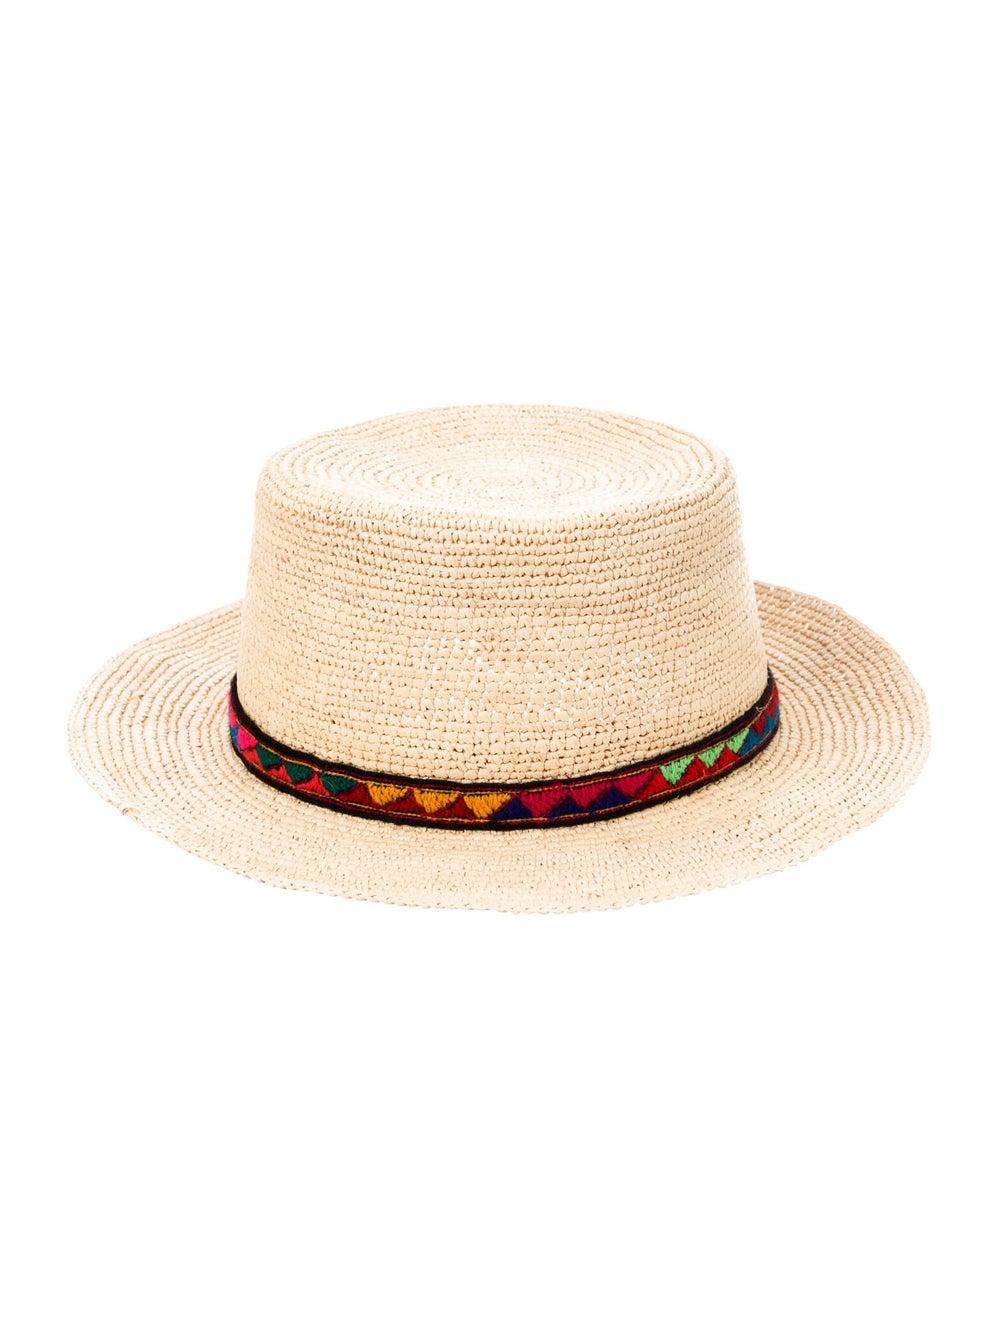 Sensi Studio Straw Wide-Brim Hat Khaki - image 2